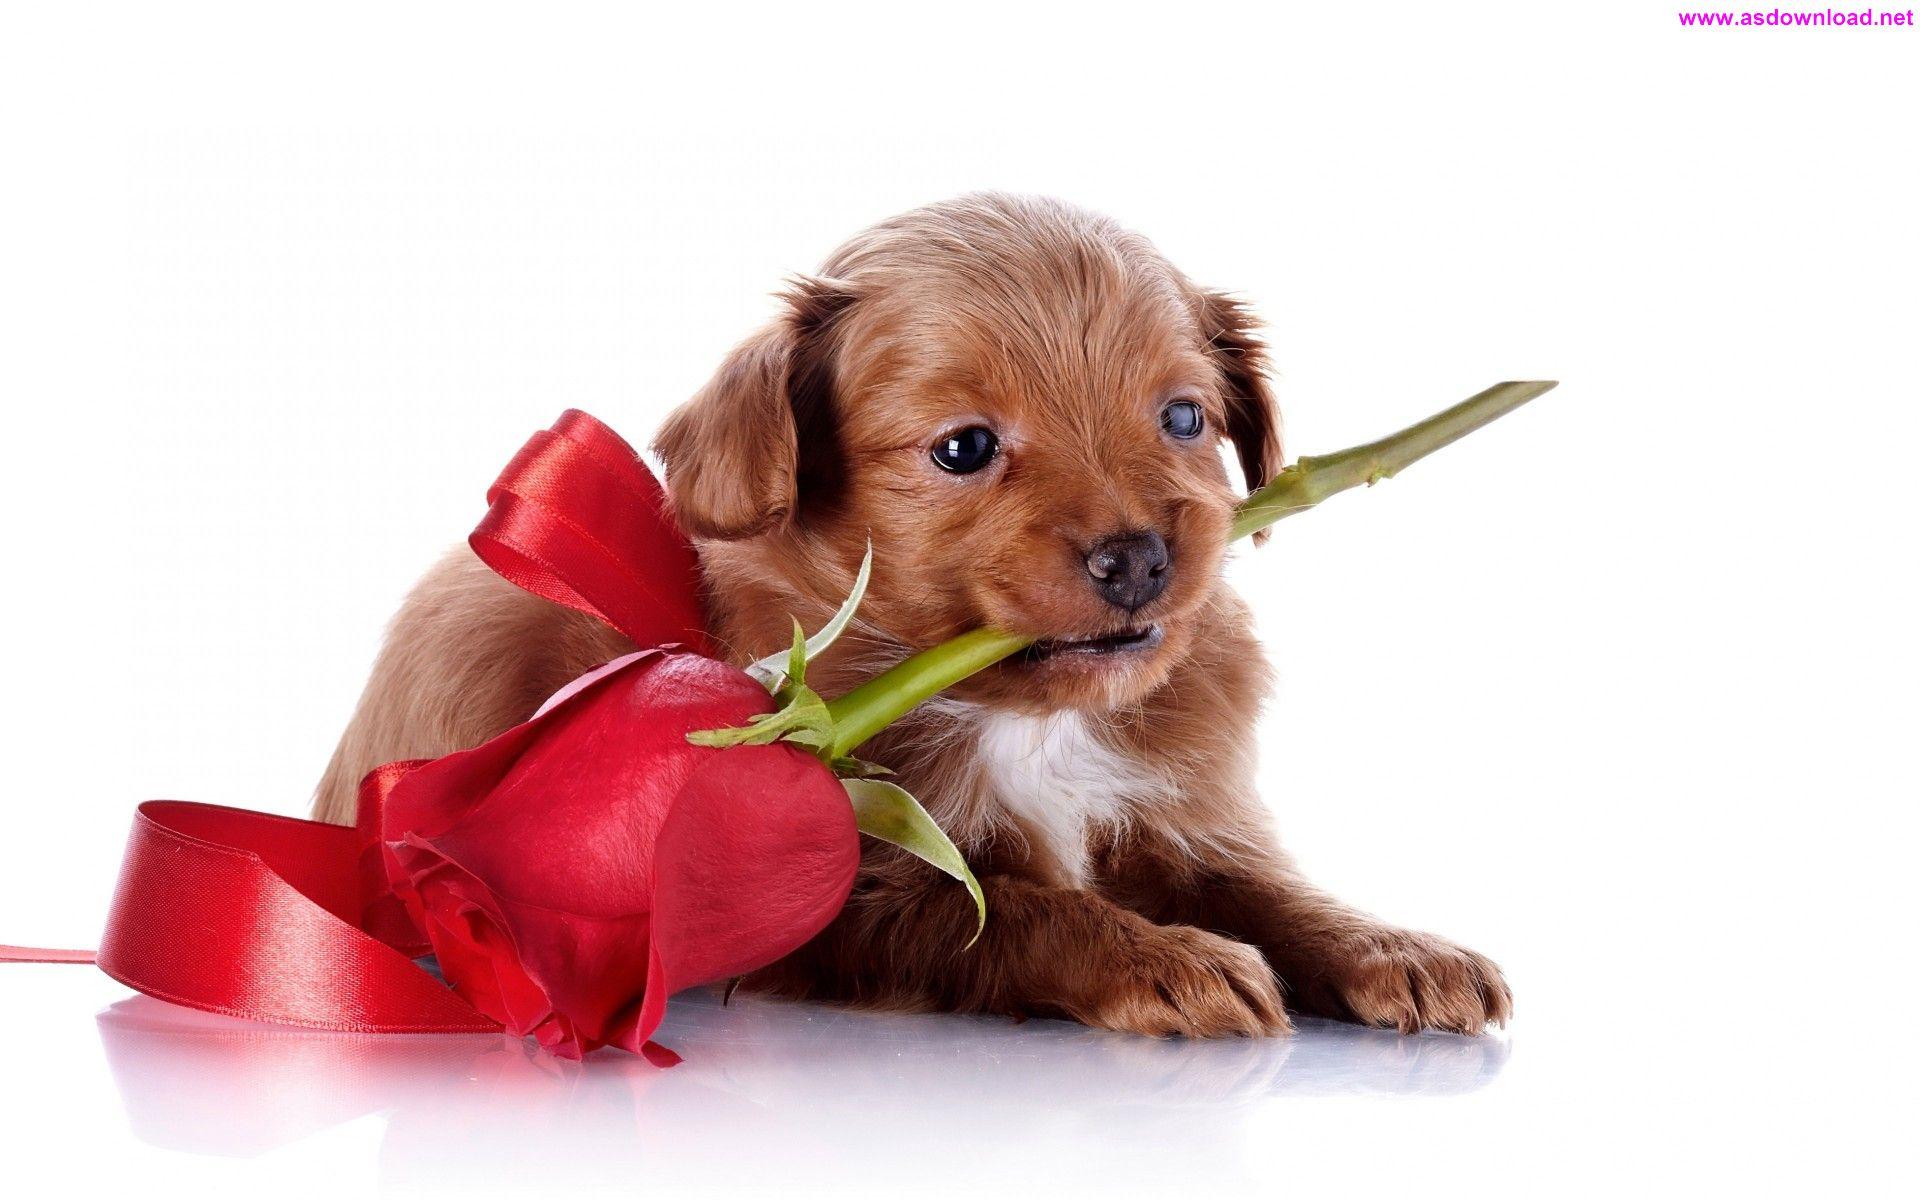 Dog Puppy Rose Wallpaper دانلود والپیپر جدید 2015